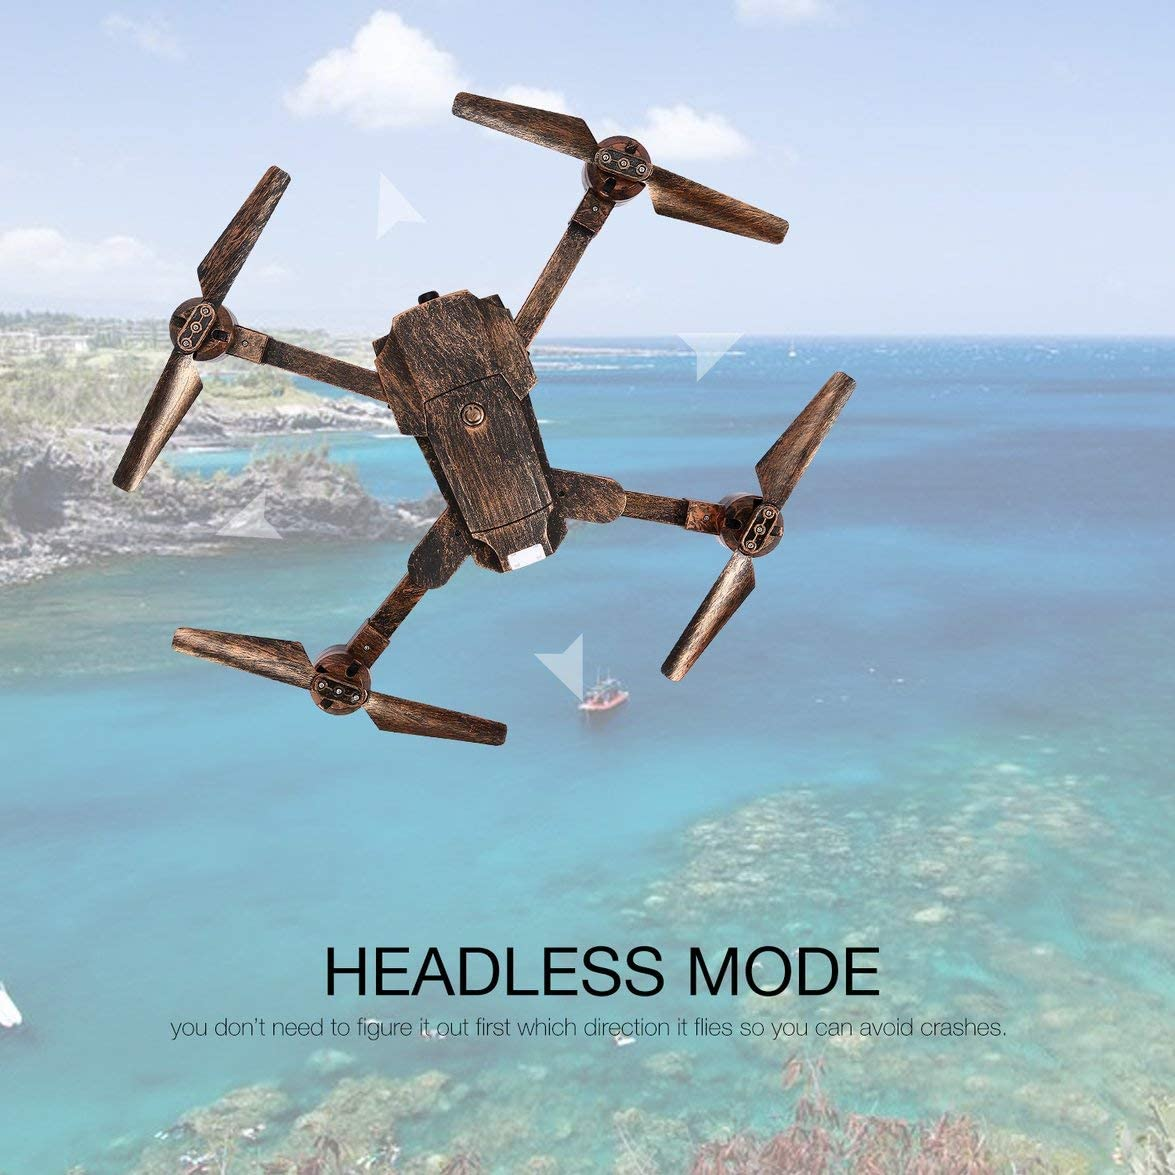 Kongqiabona Attop X-PACK1 2.4 G Drone 720P HD WiFi Cámara de Gran Angular Live Video FPV RC Quadcopter Plegable con retención de altitud sin Cabeza: Amazon.es: Hogar